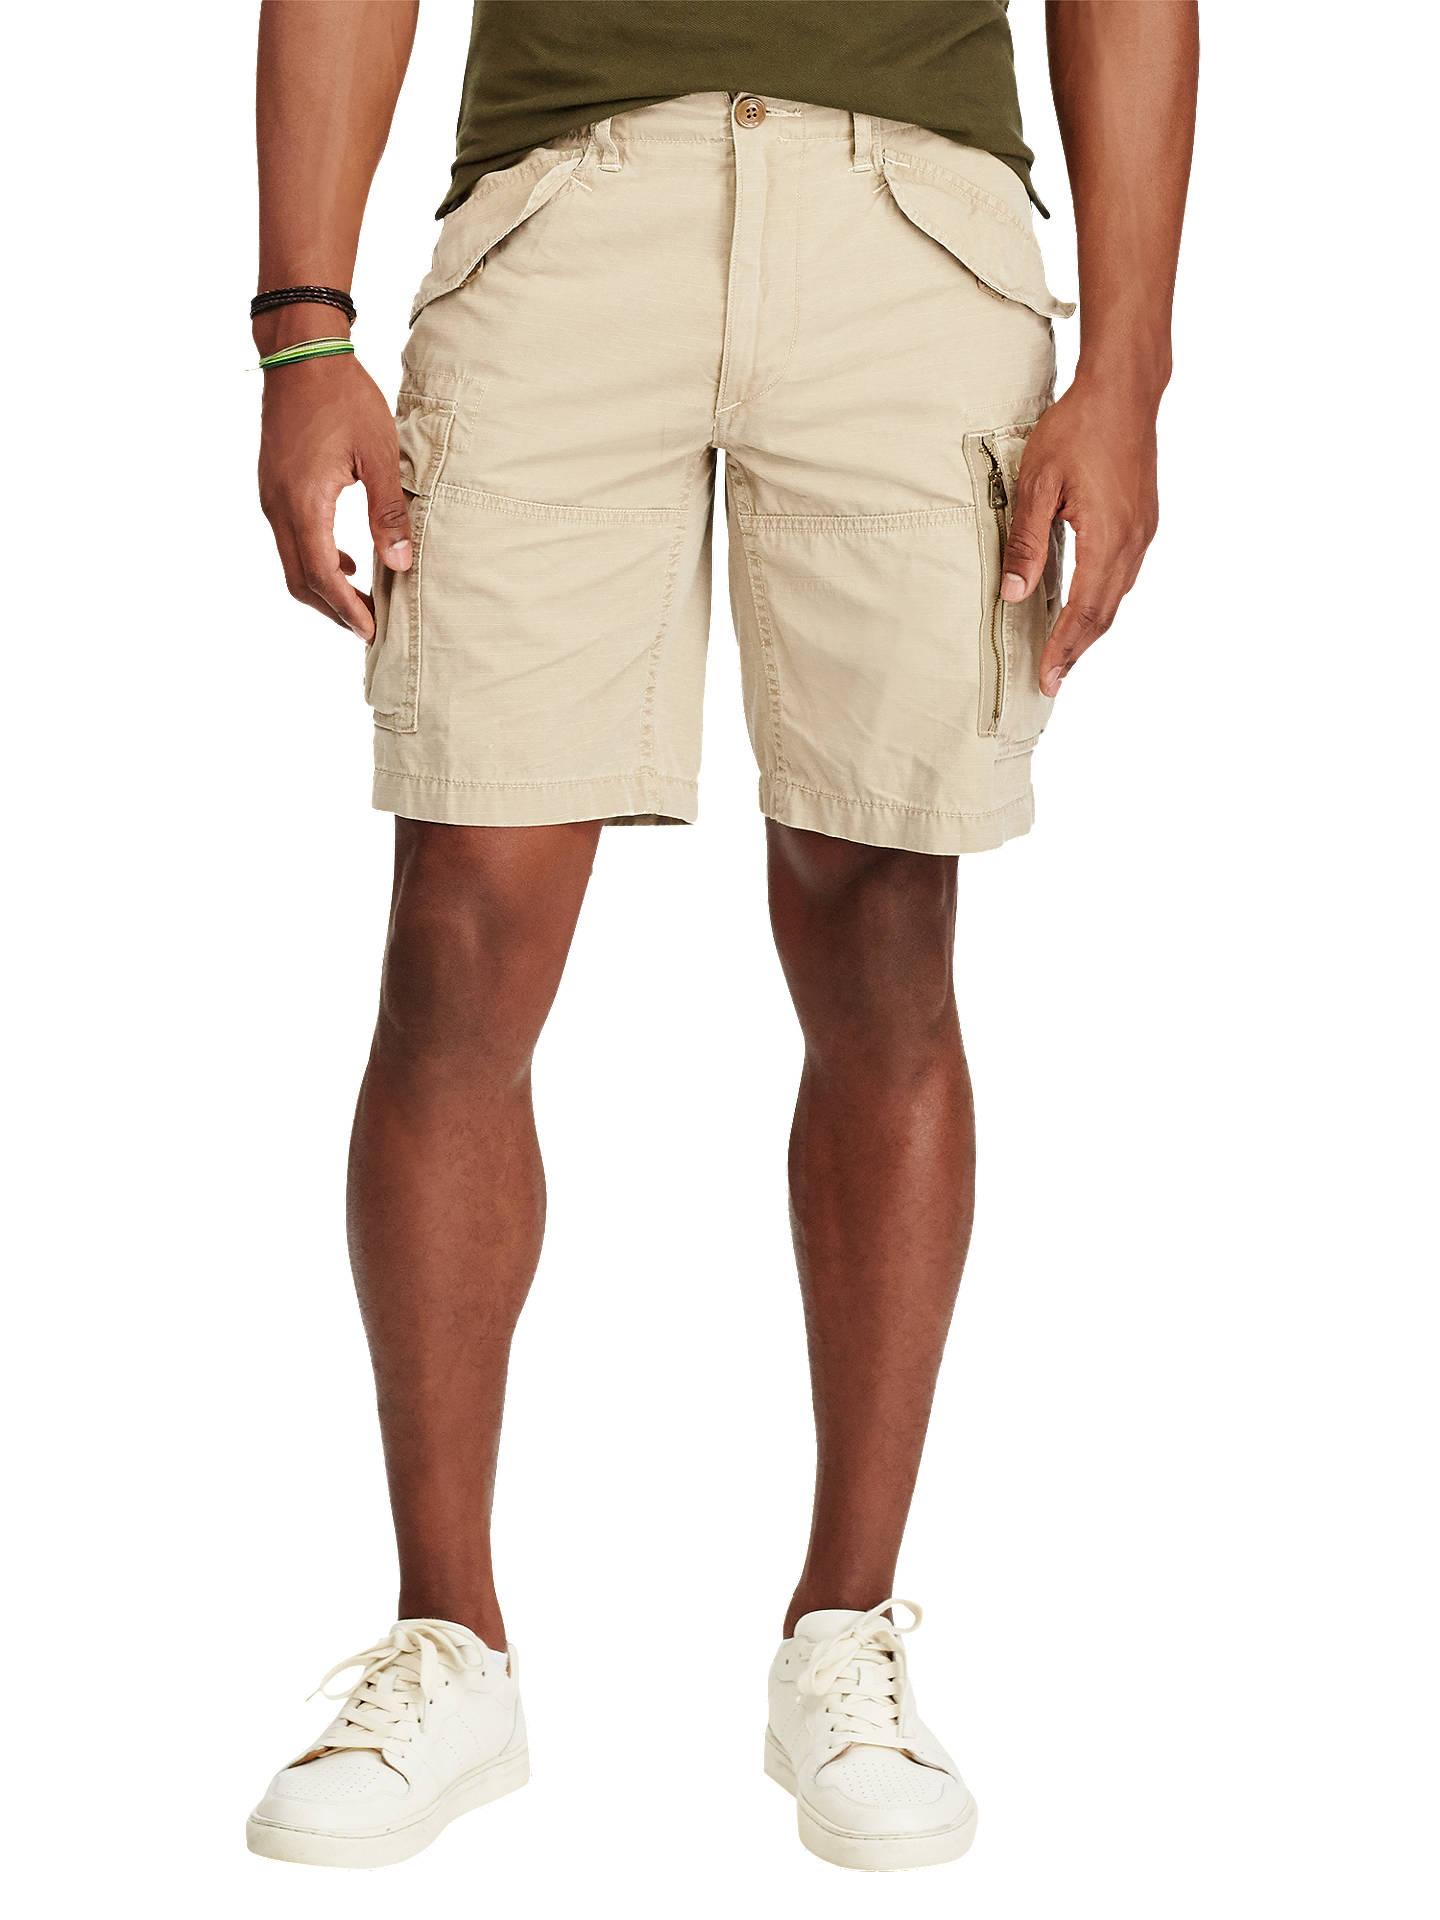 113e83d3c0 Buy Polo Ralph Lauren Classic Fit Cotton Cargo Shorts, Boating Khaki, 30R  Online at ...